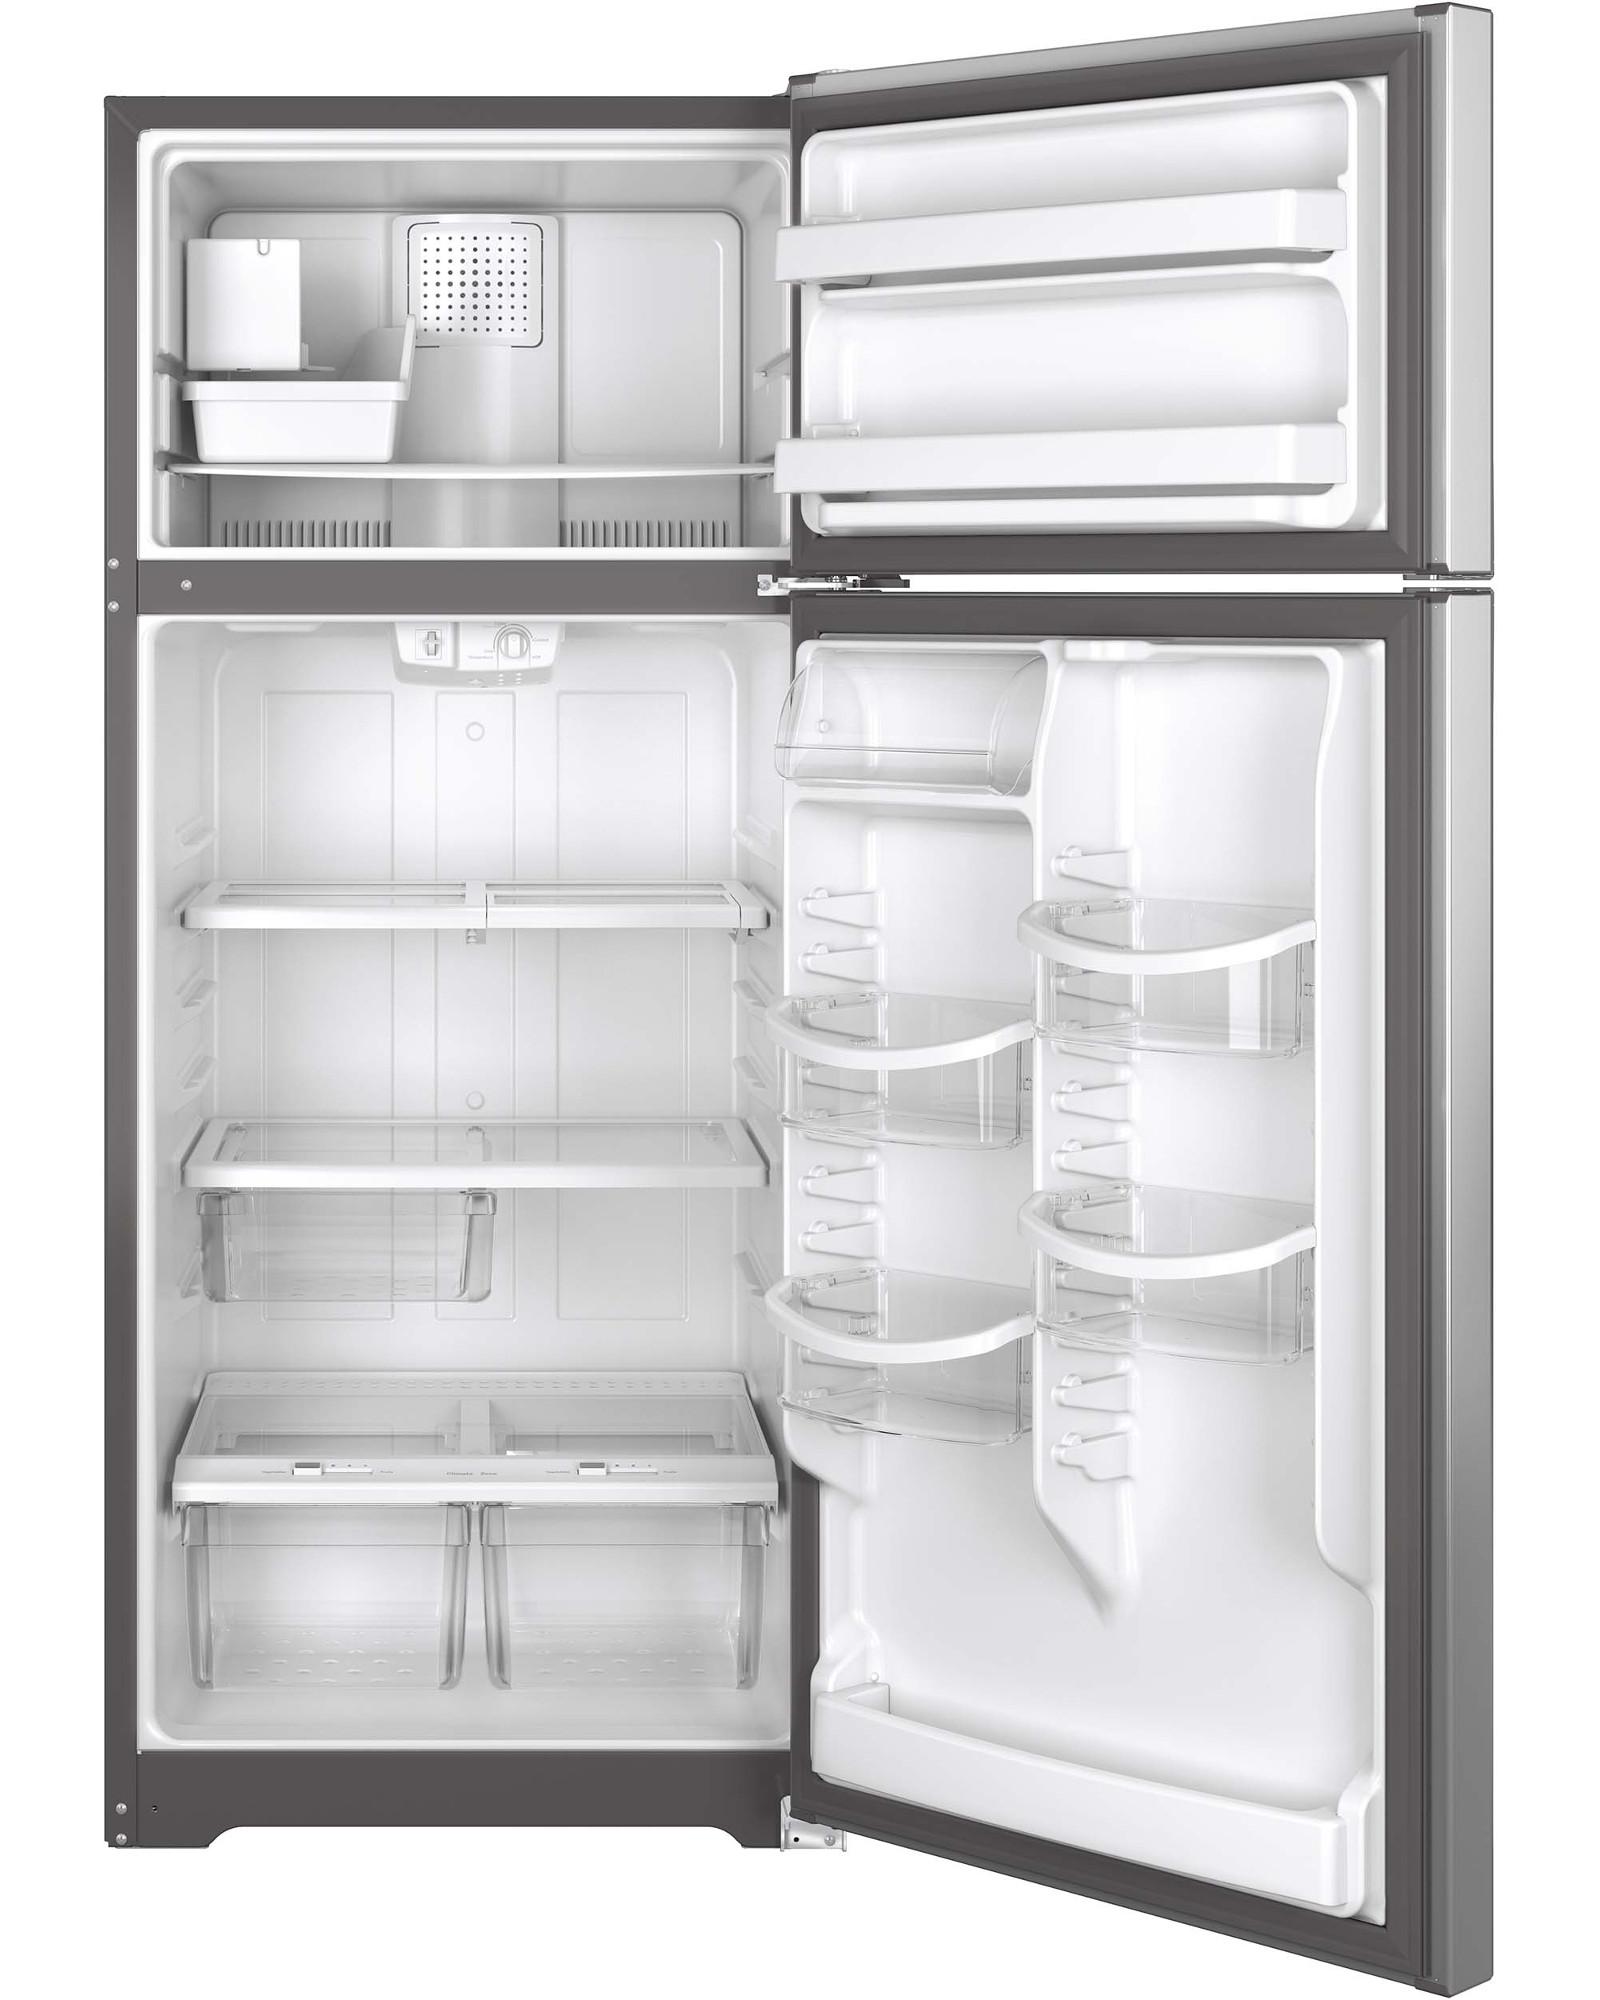 GE Appliances GIE18HSHSS 17.6 cu. ft. Top-Freezer Refrigerator - Stainless Steel